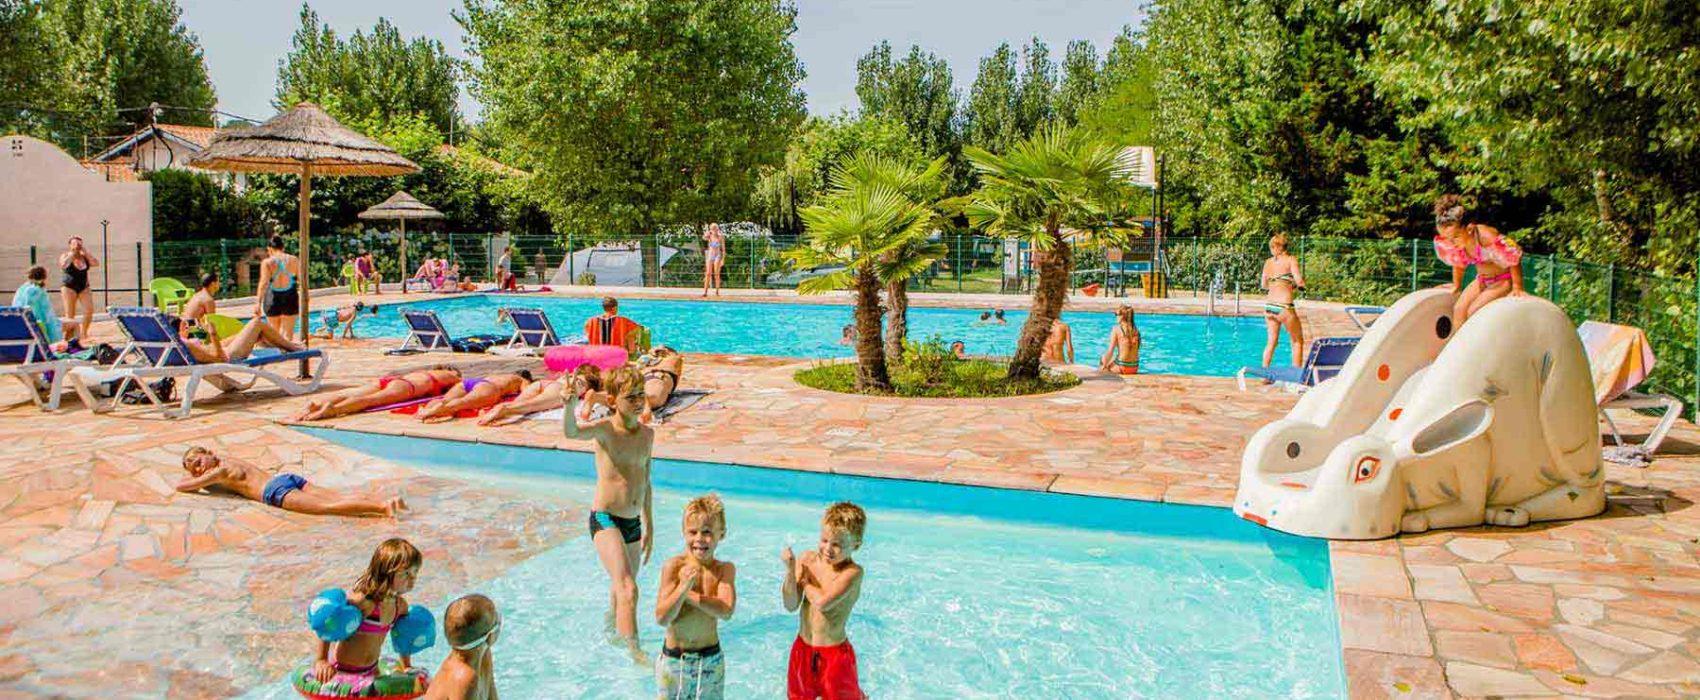 camping avec piscine au pays basque